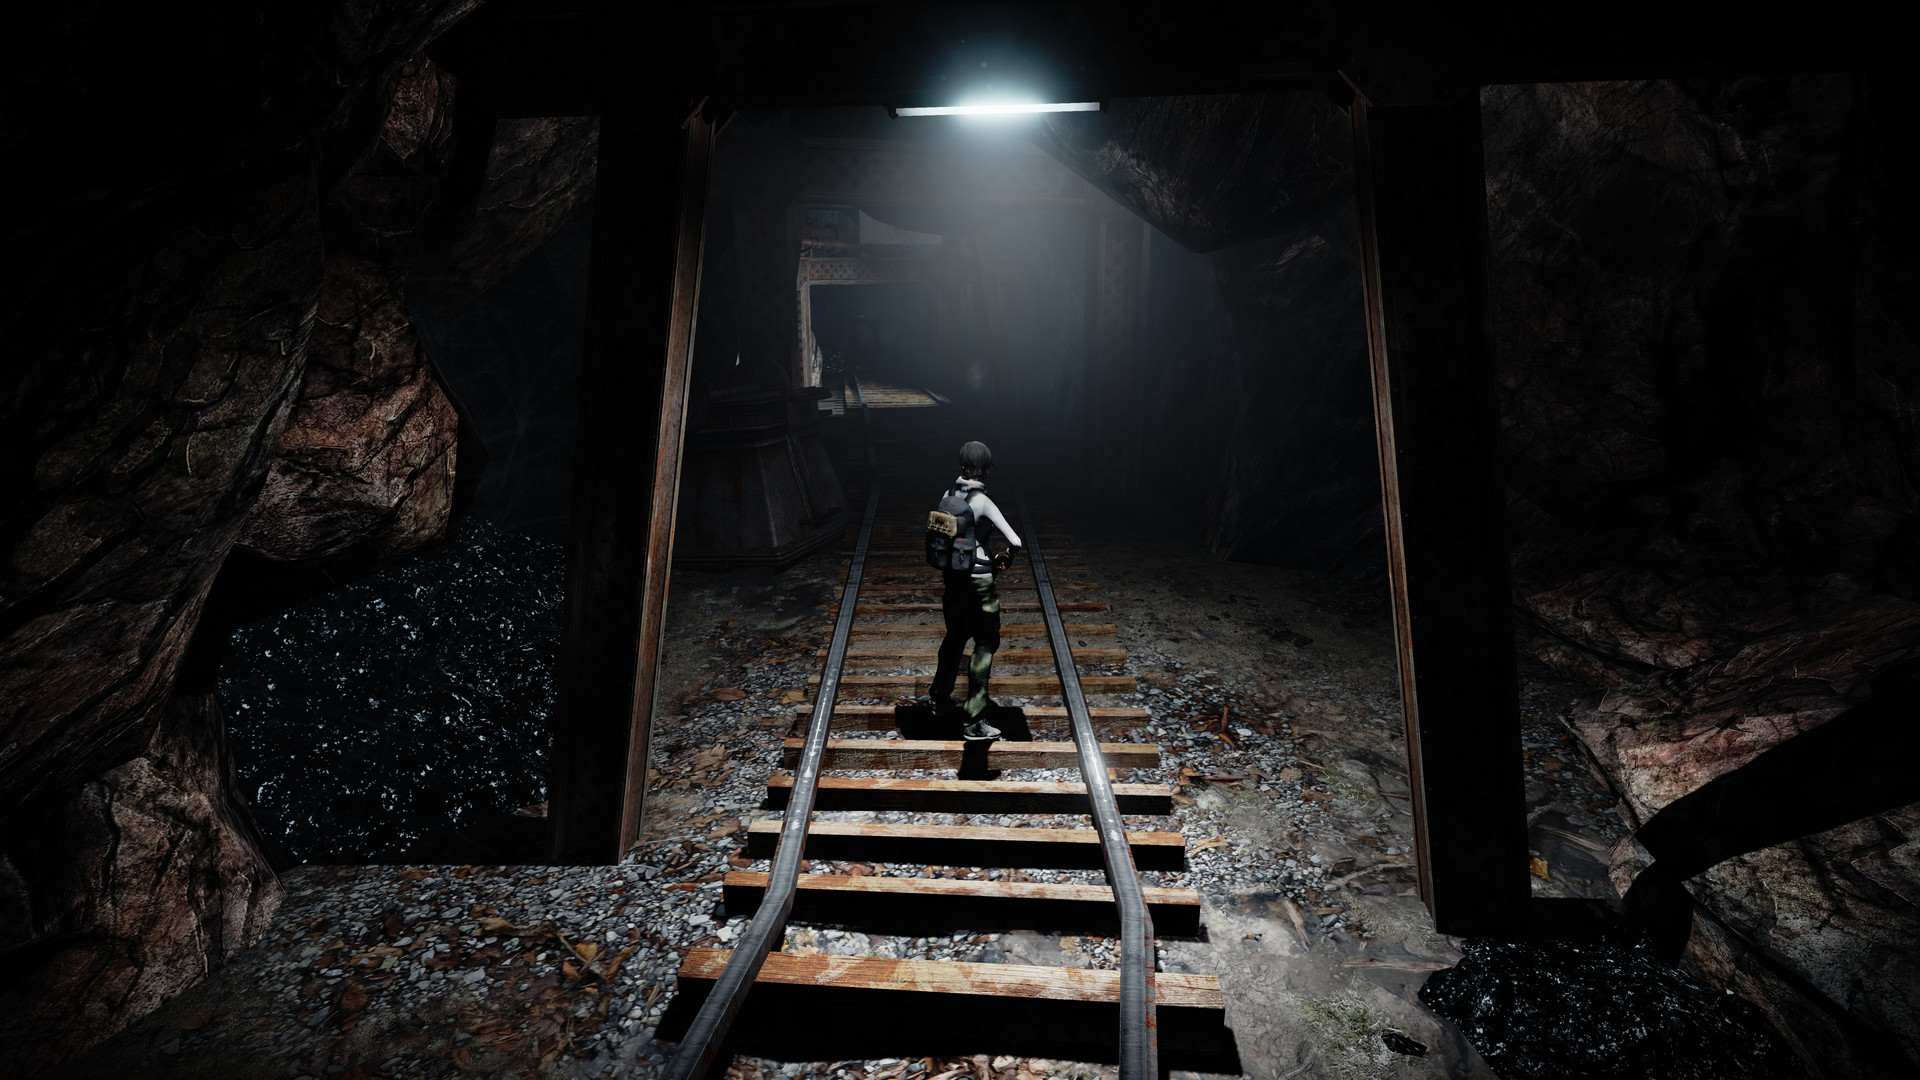 Alone In The Dark Illumination On Steam